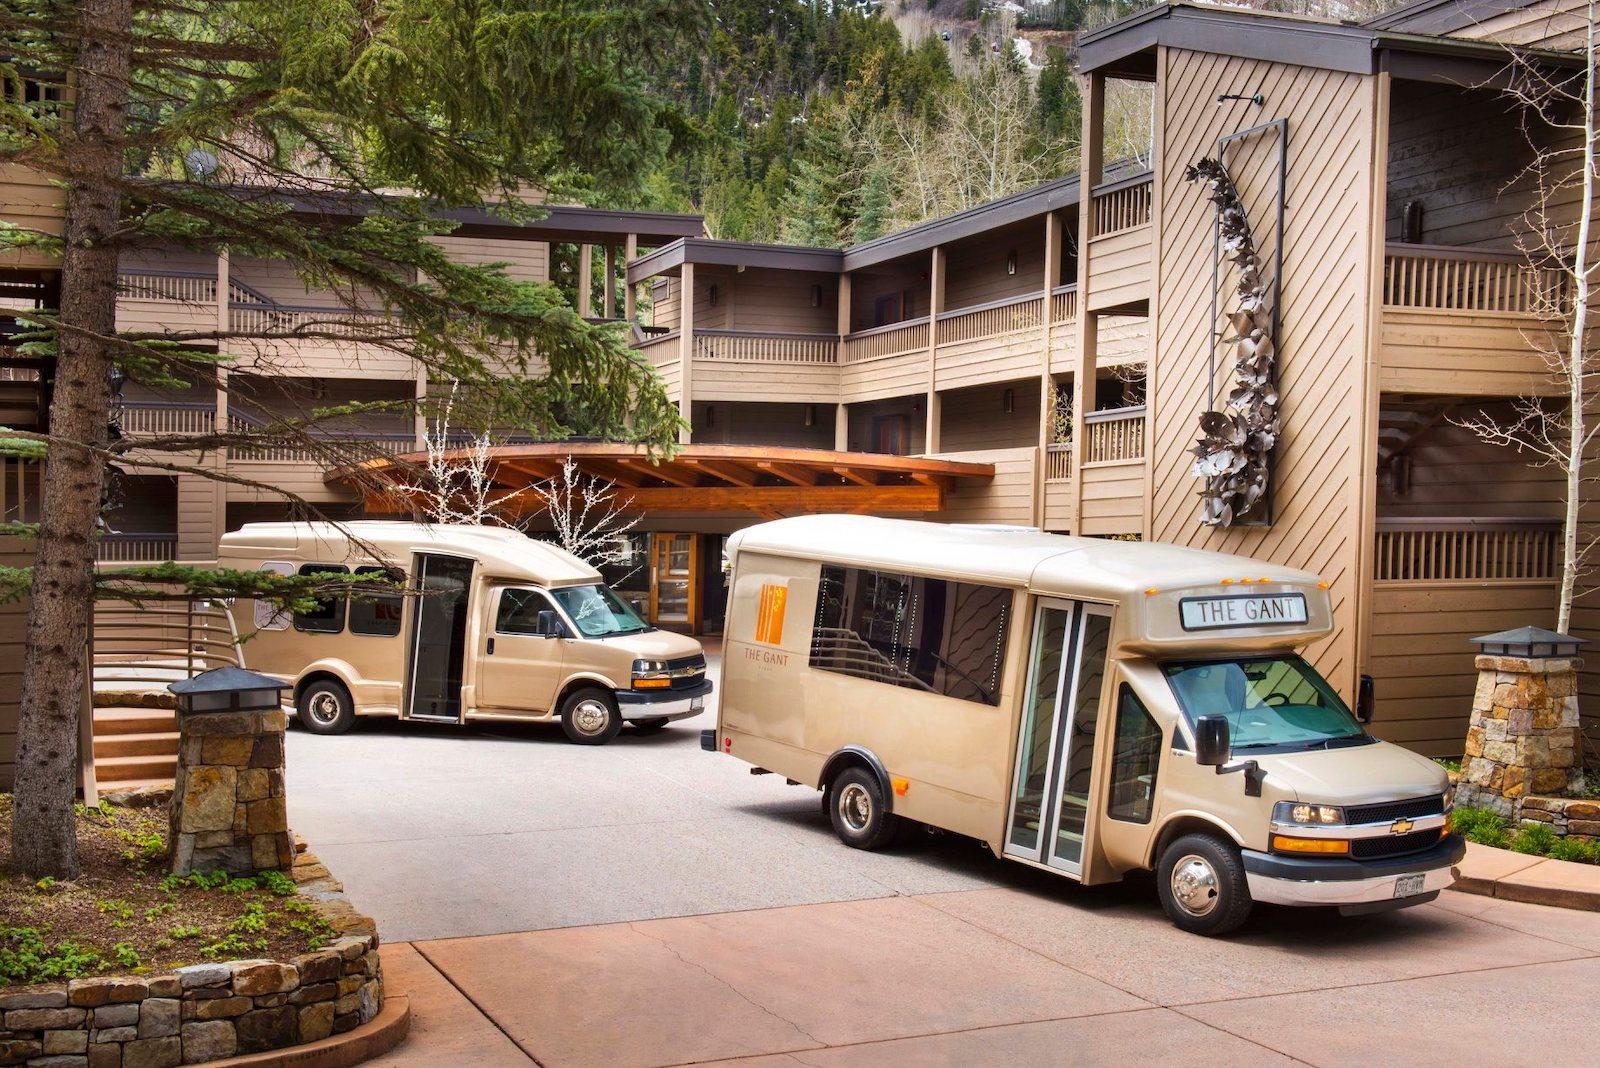 Image of shuttle buses outside of The Gant in Aspen, Colorado